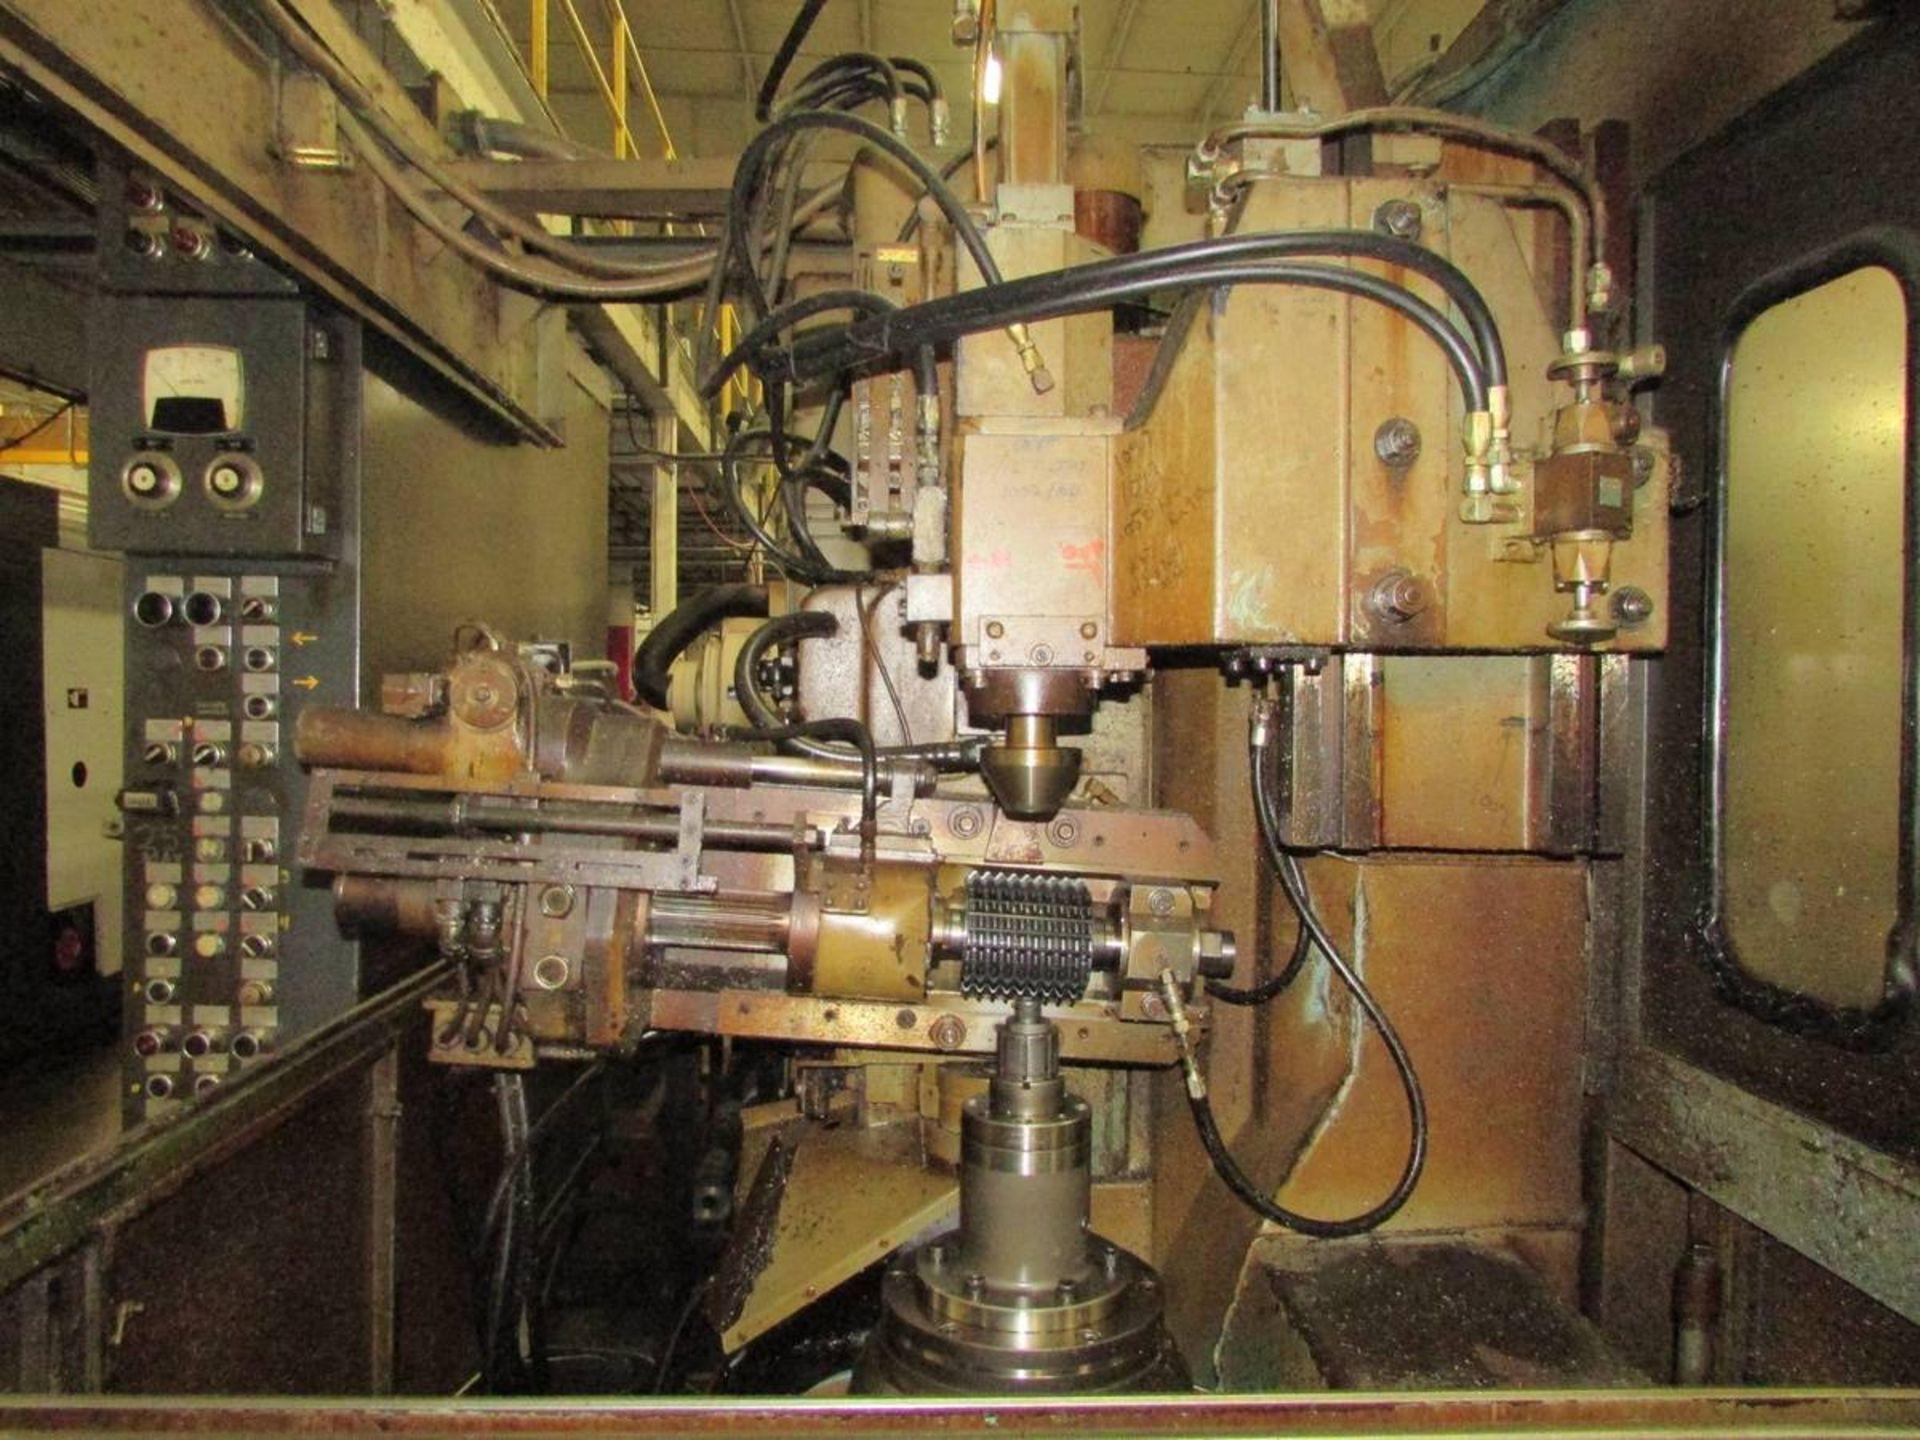 Cleveland/ Waterbury Farrel CR300-612-002 Universal CNC Gear Hobbing Machine - Image 3 of 19